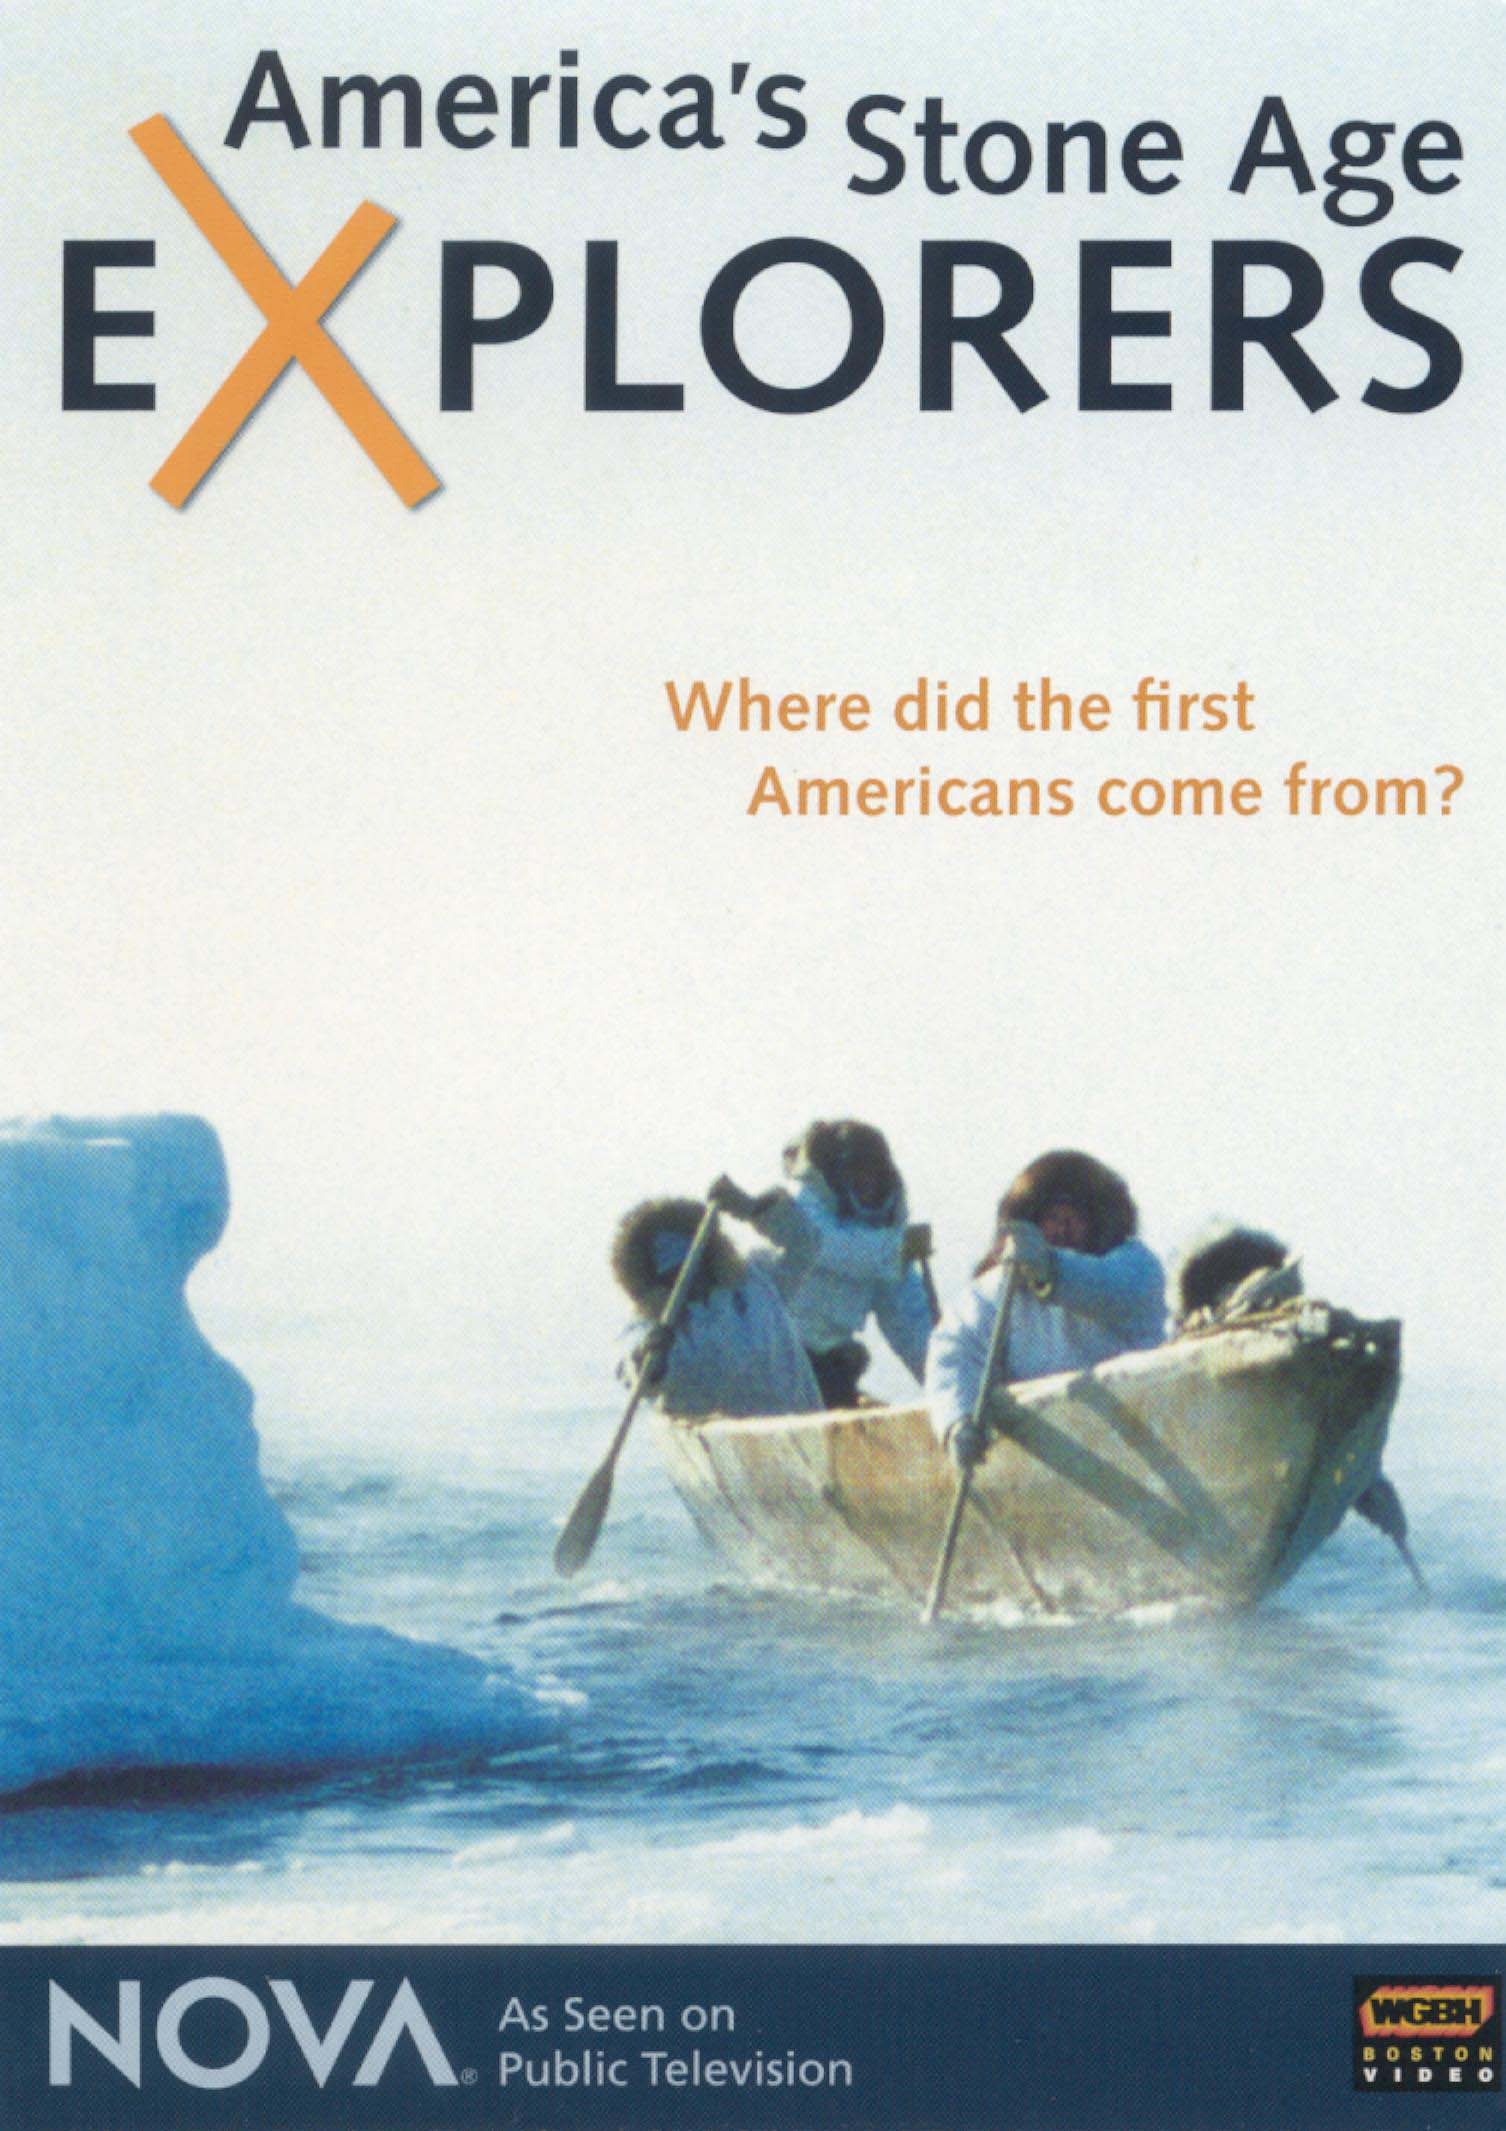 NOVA: America's Stone Age Explorers